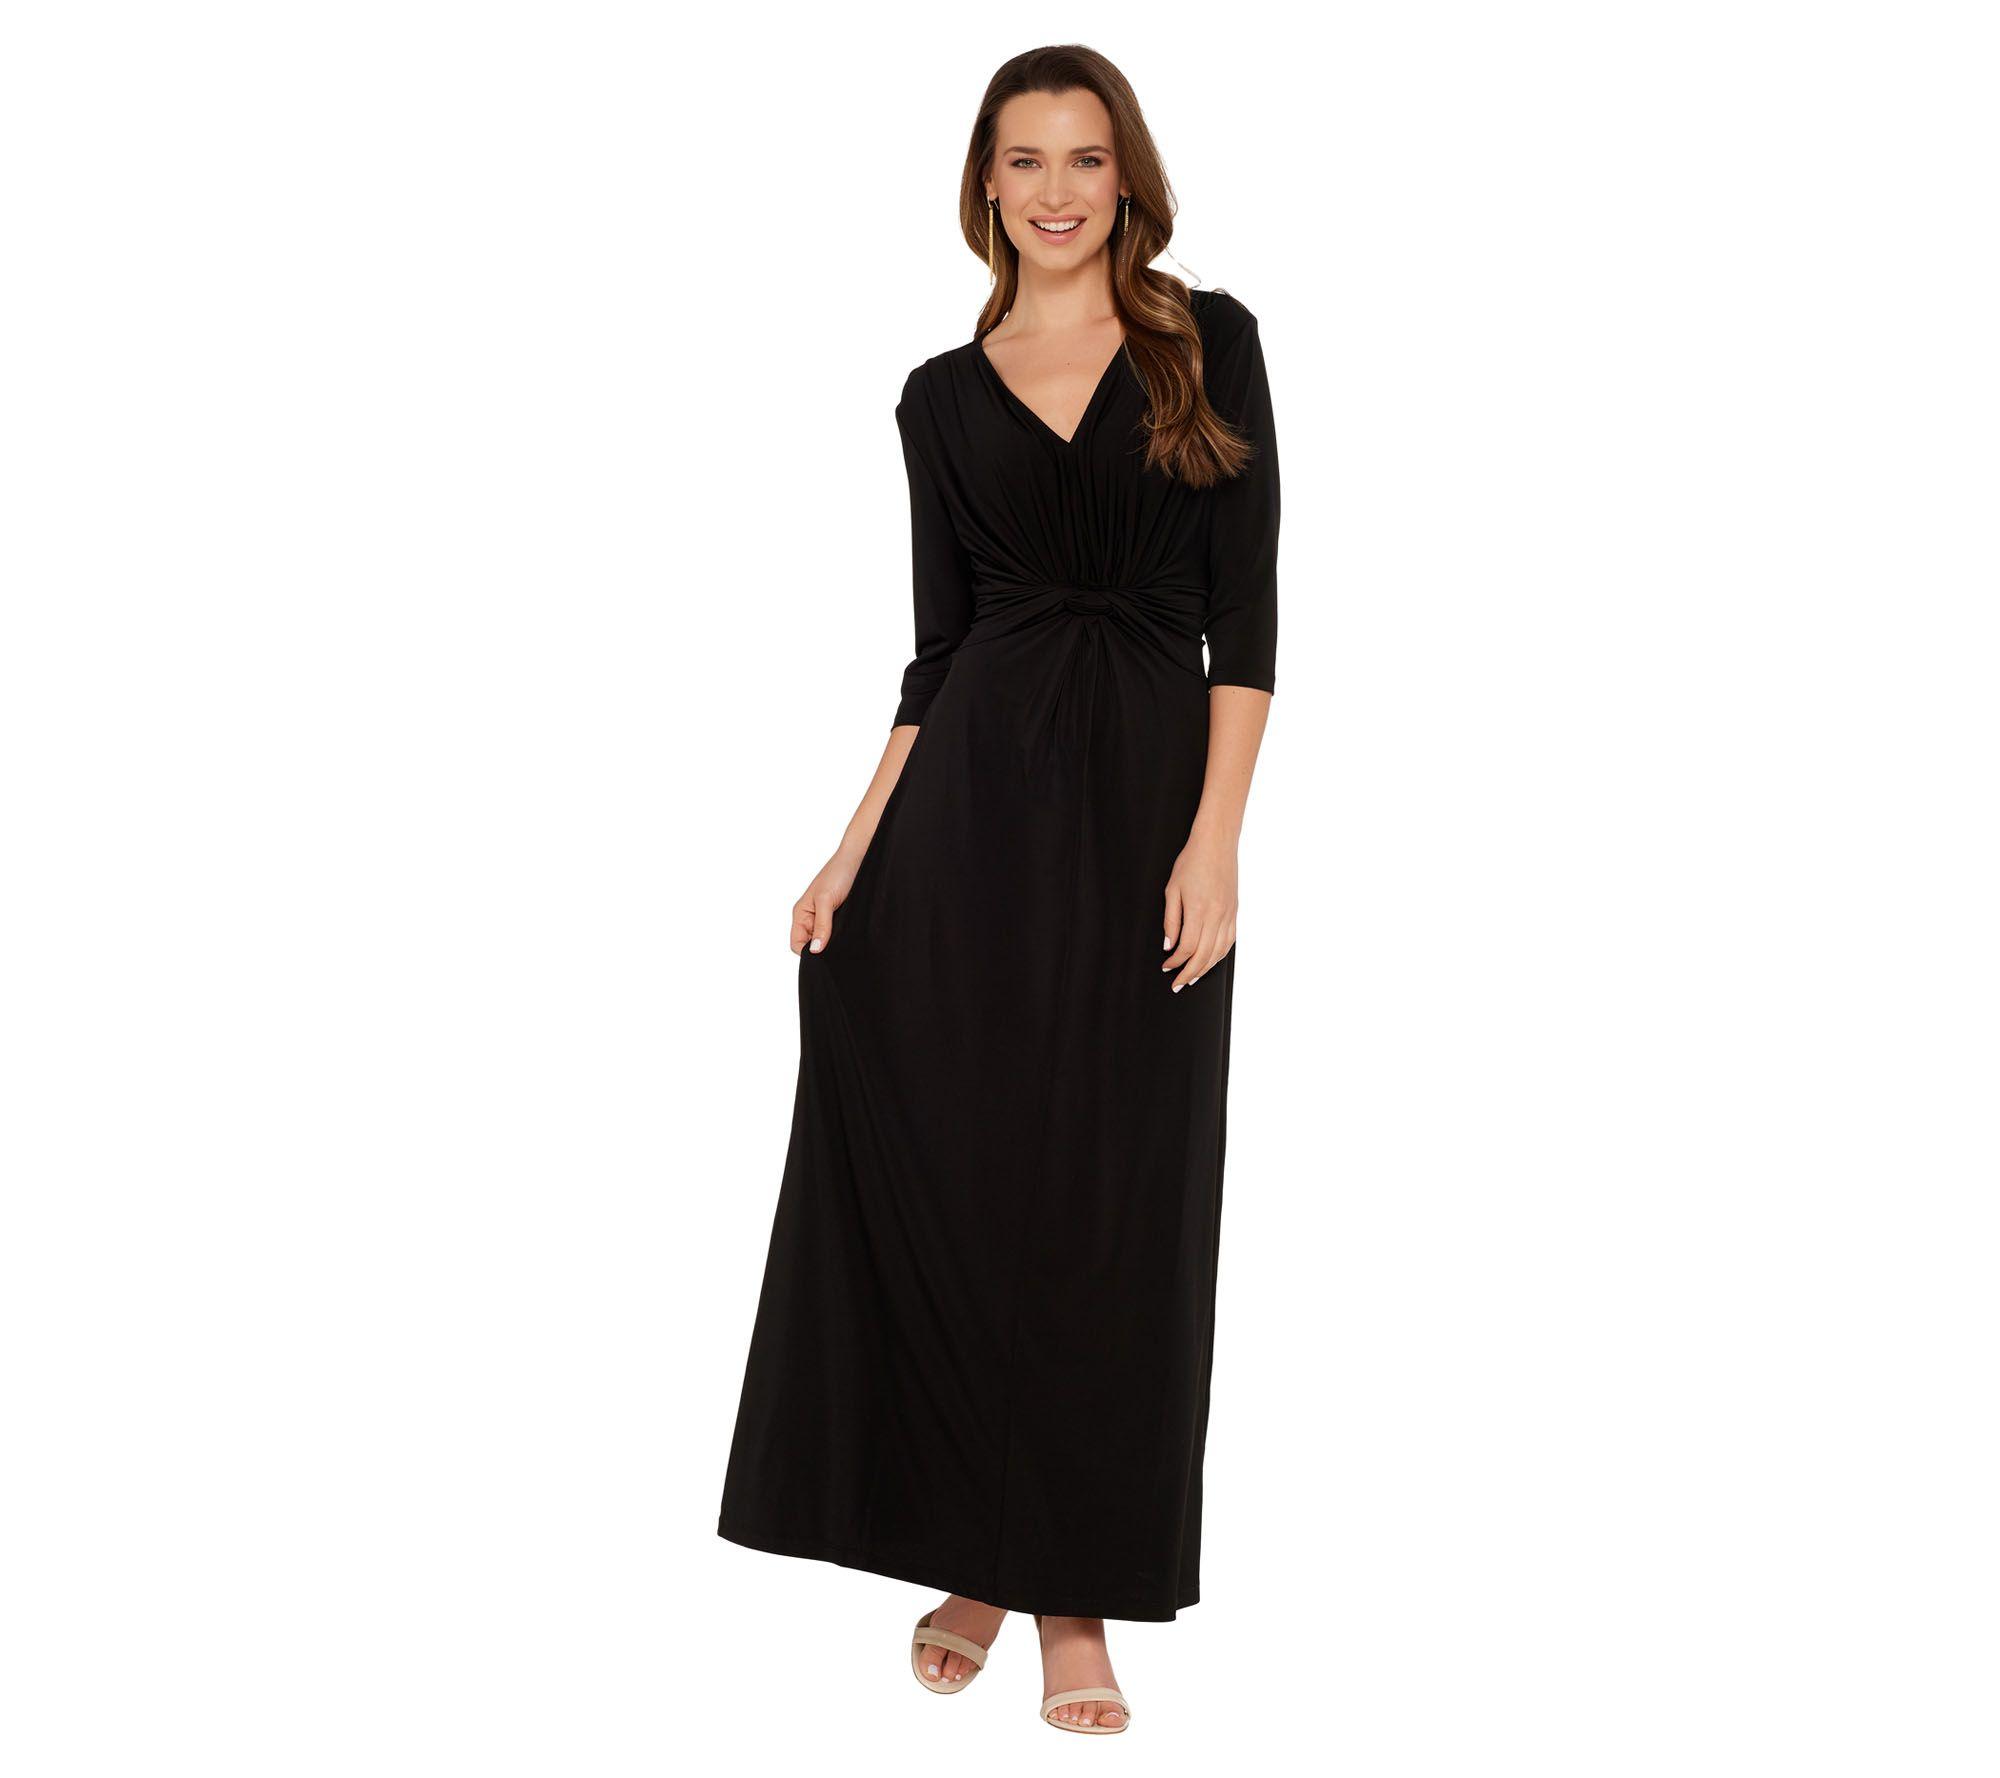 7af5948e63a2f G.I.L.I. Petite 3/4 Sleeve Twist Front Maxi Dress - Page 1 — QVC.com